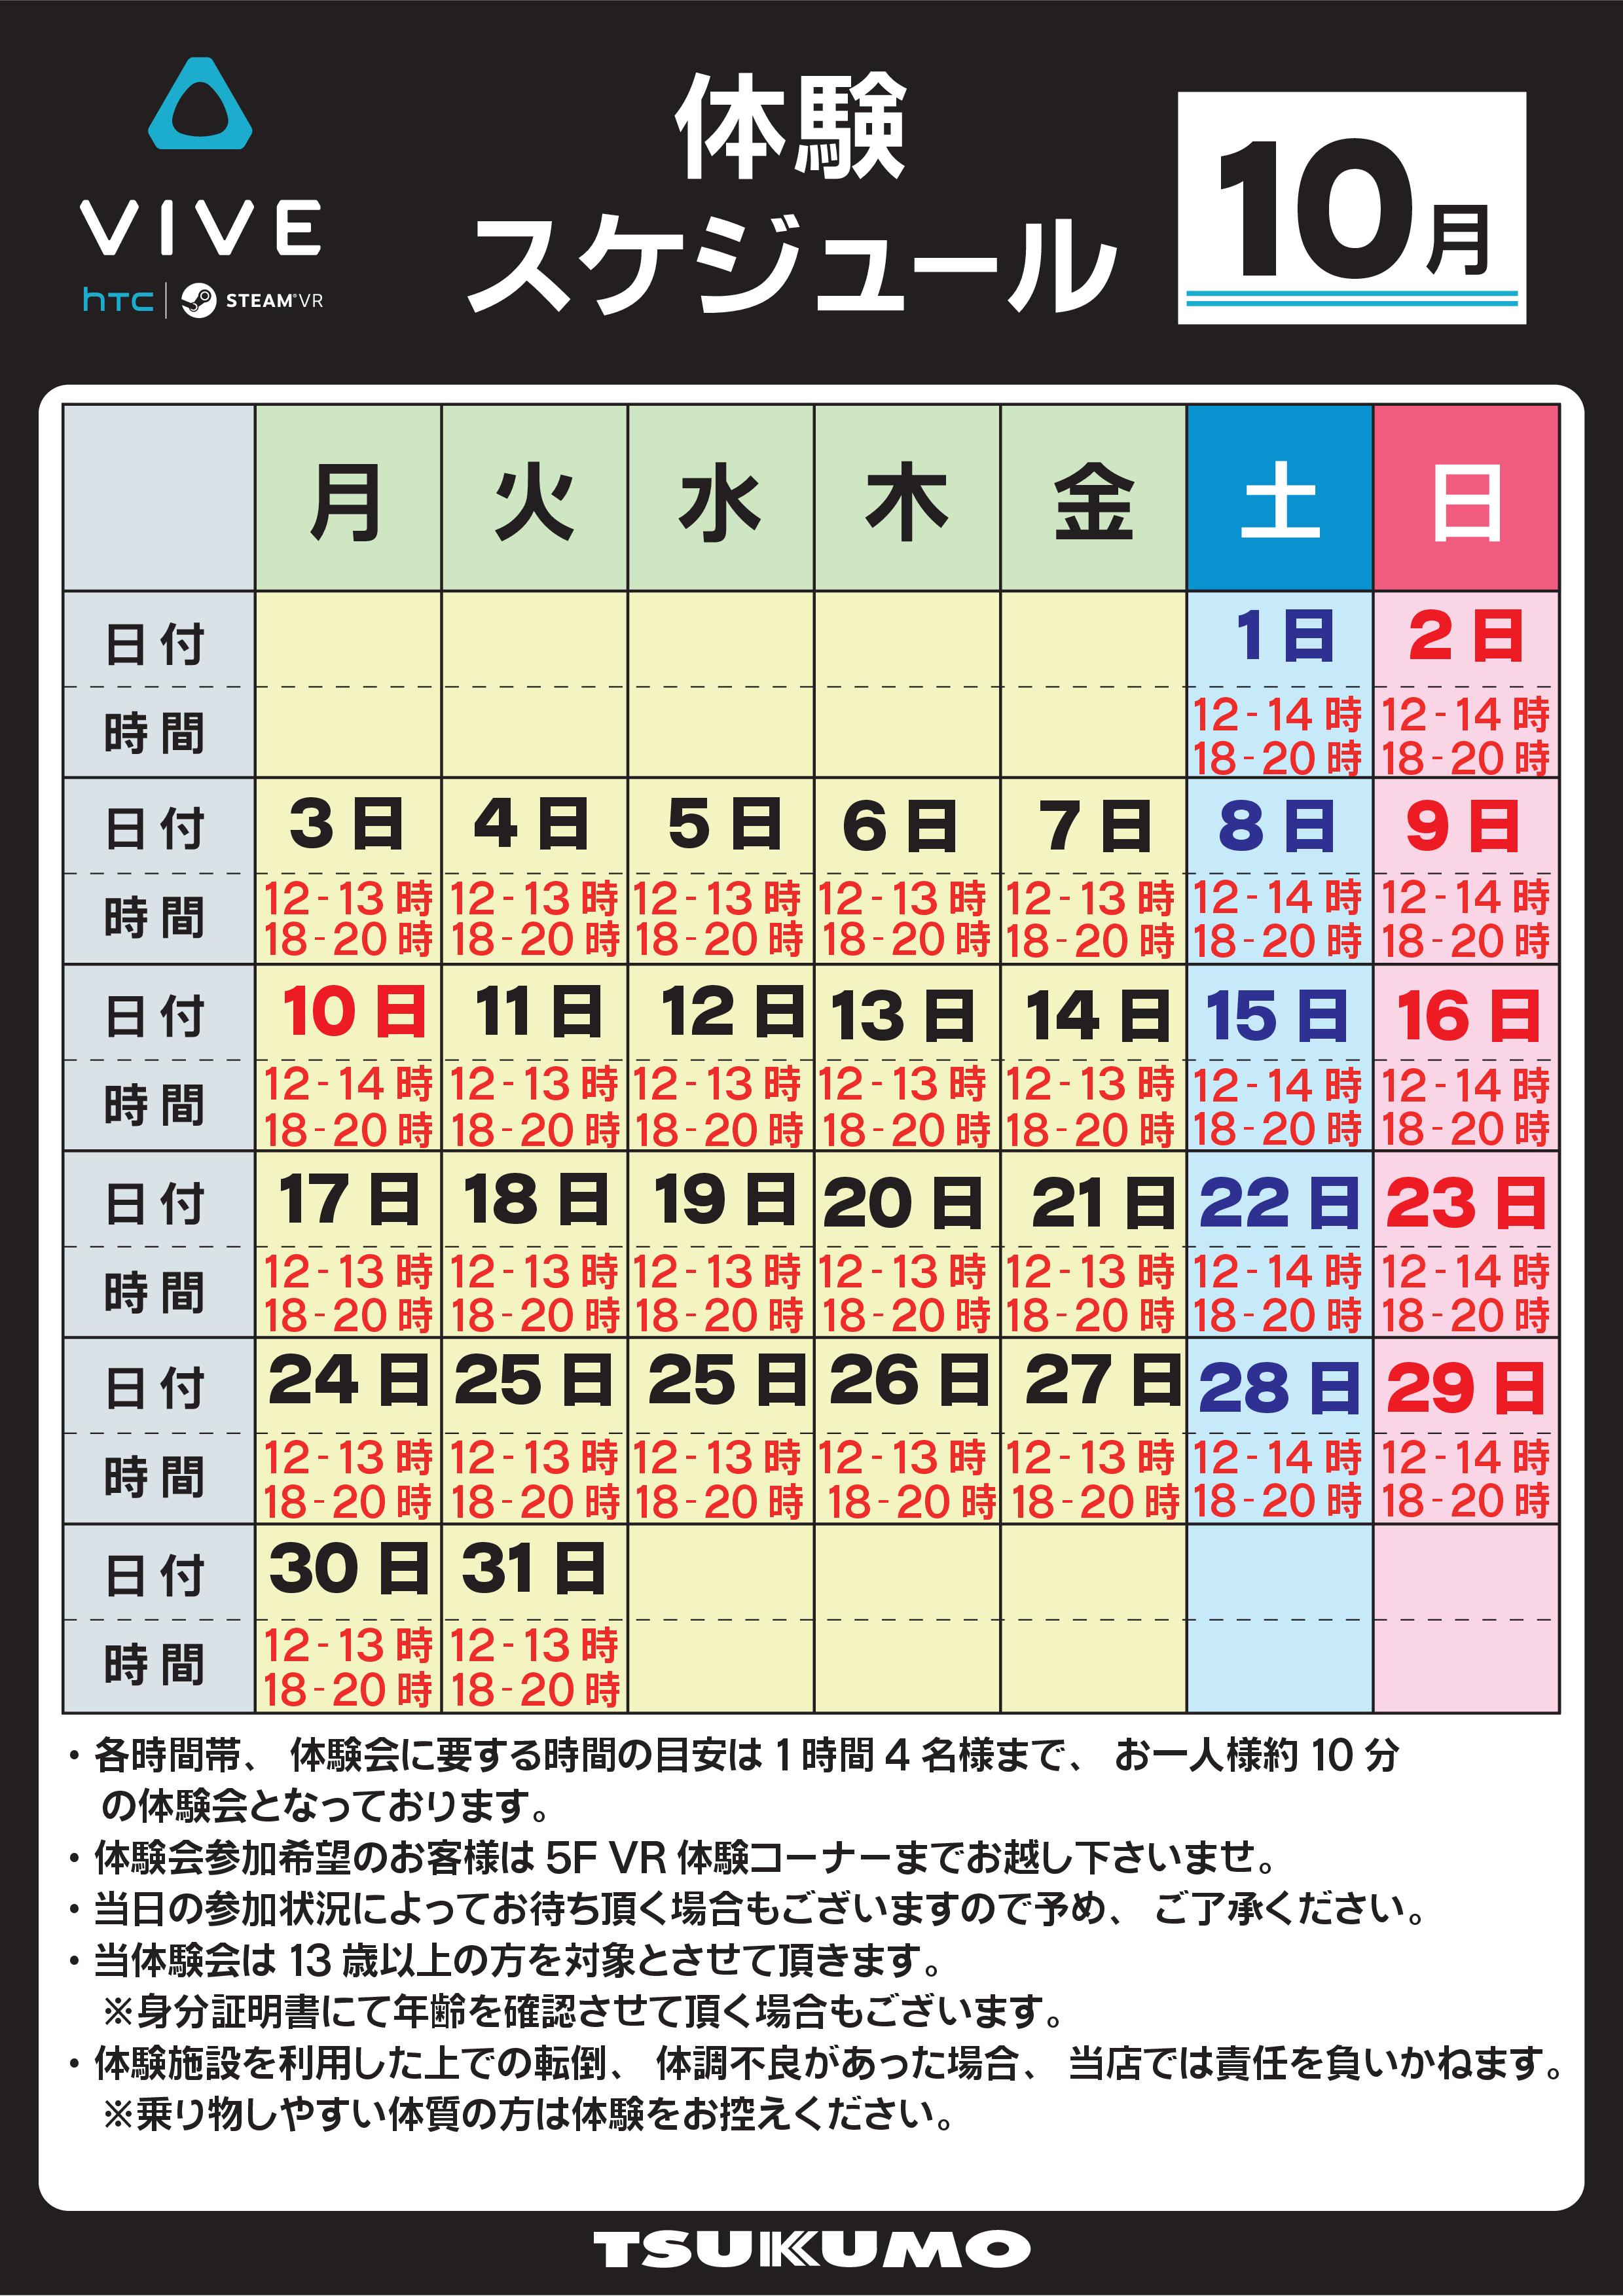 Vive体験スケジュール_1609.png